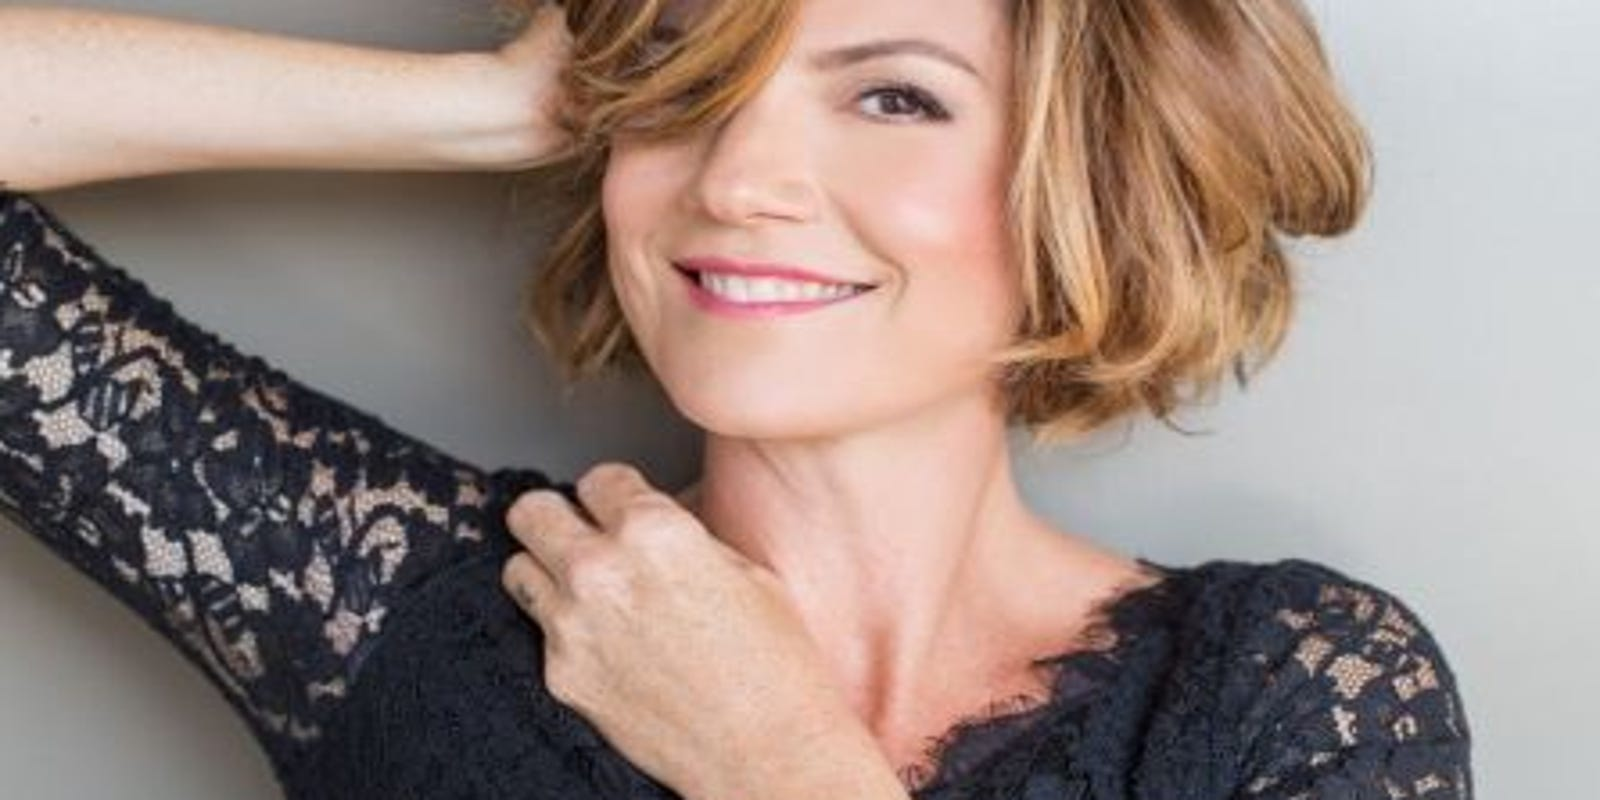 Zoe Mcclellan Joins Designated Survivor Cast